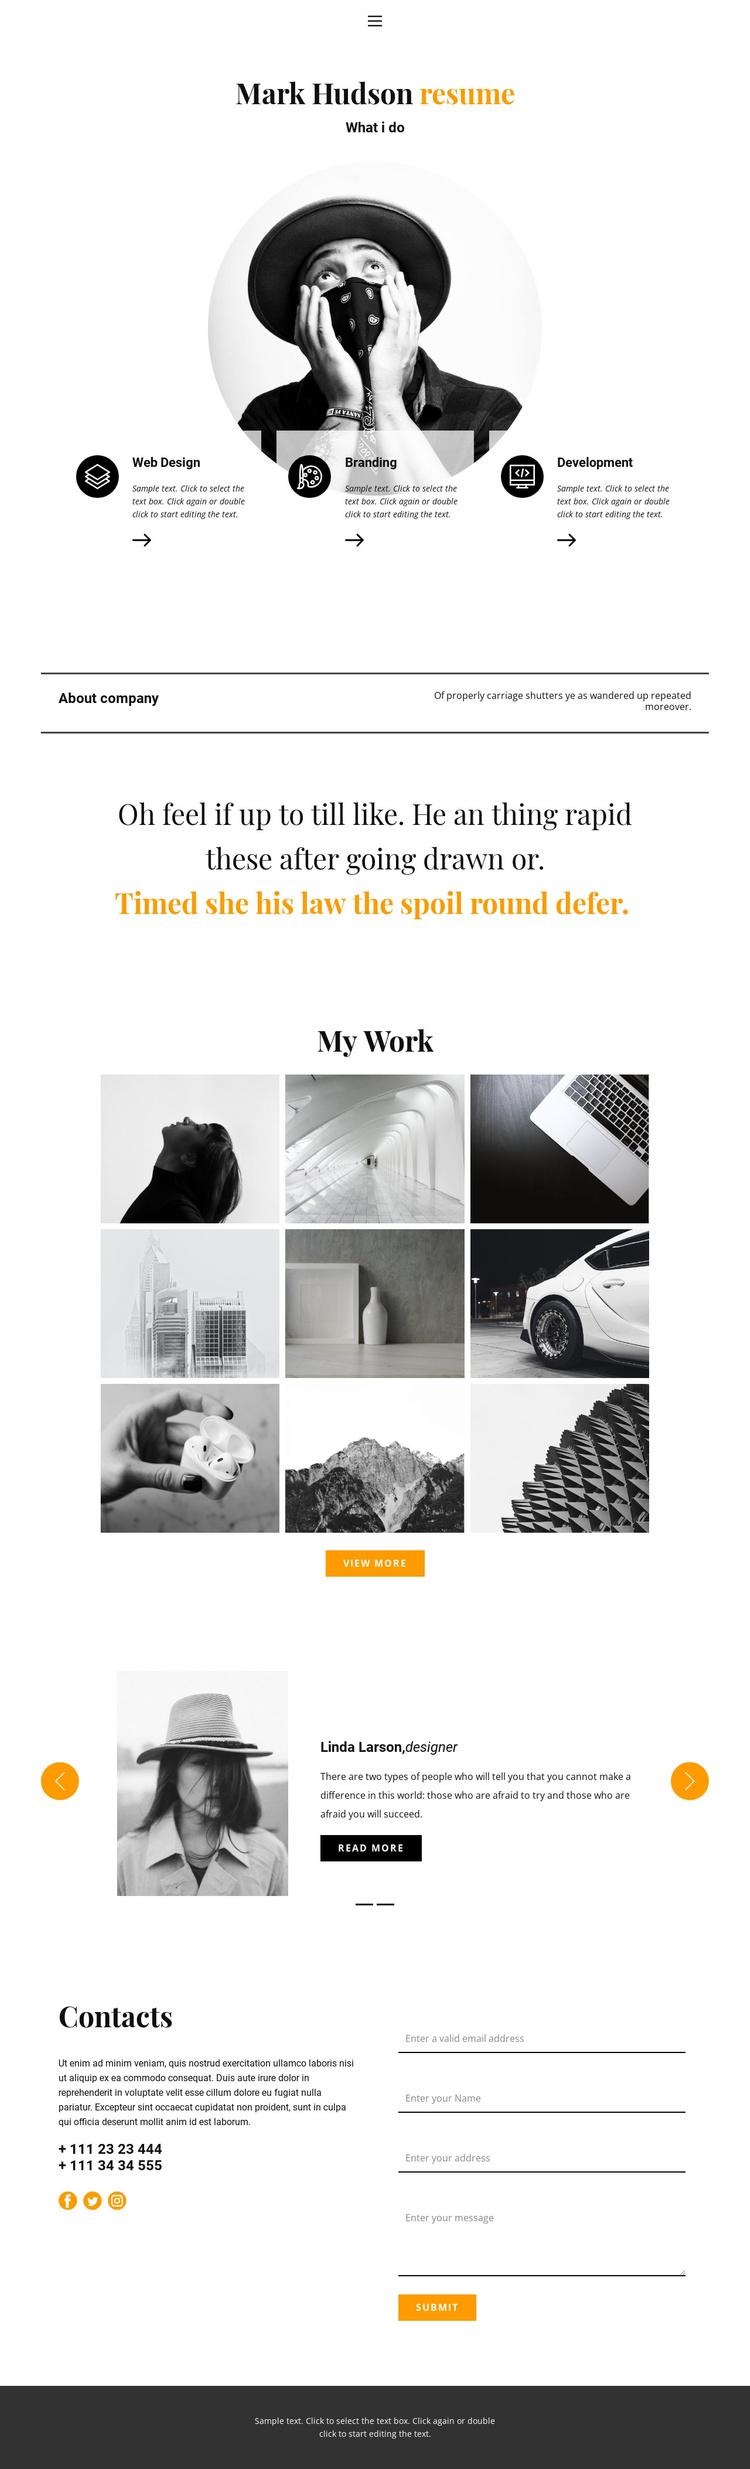 Web designer resume Joomla Template